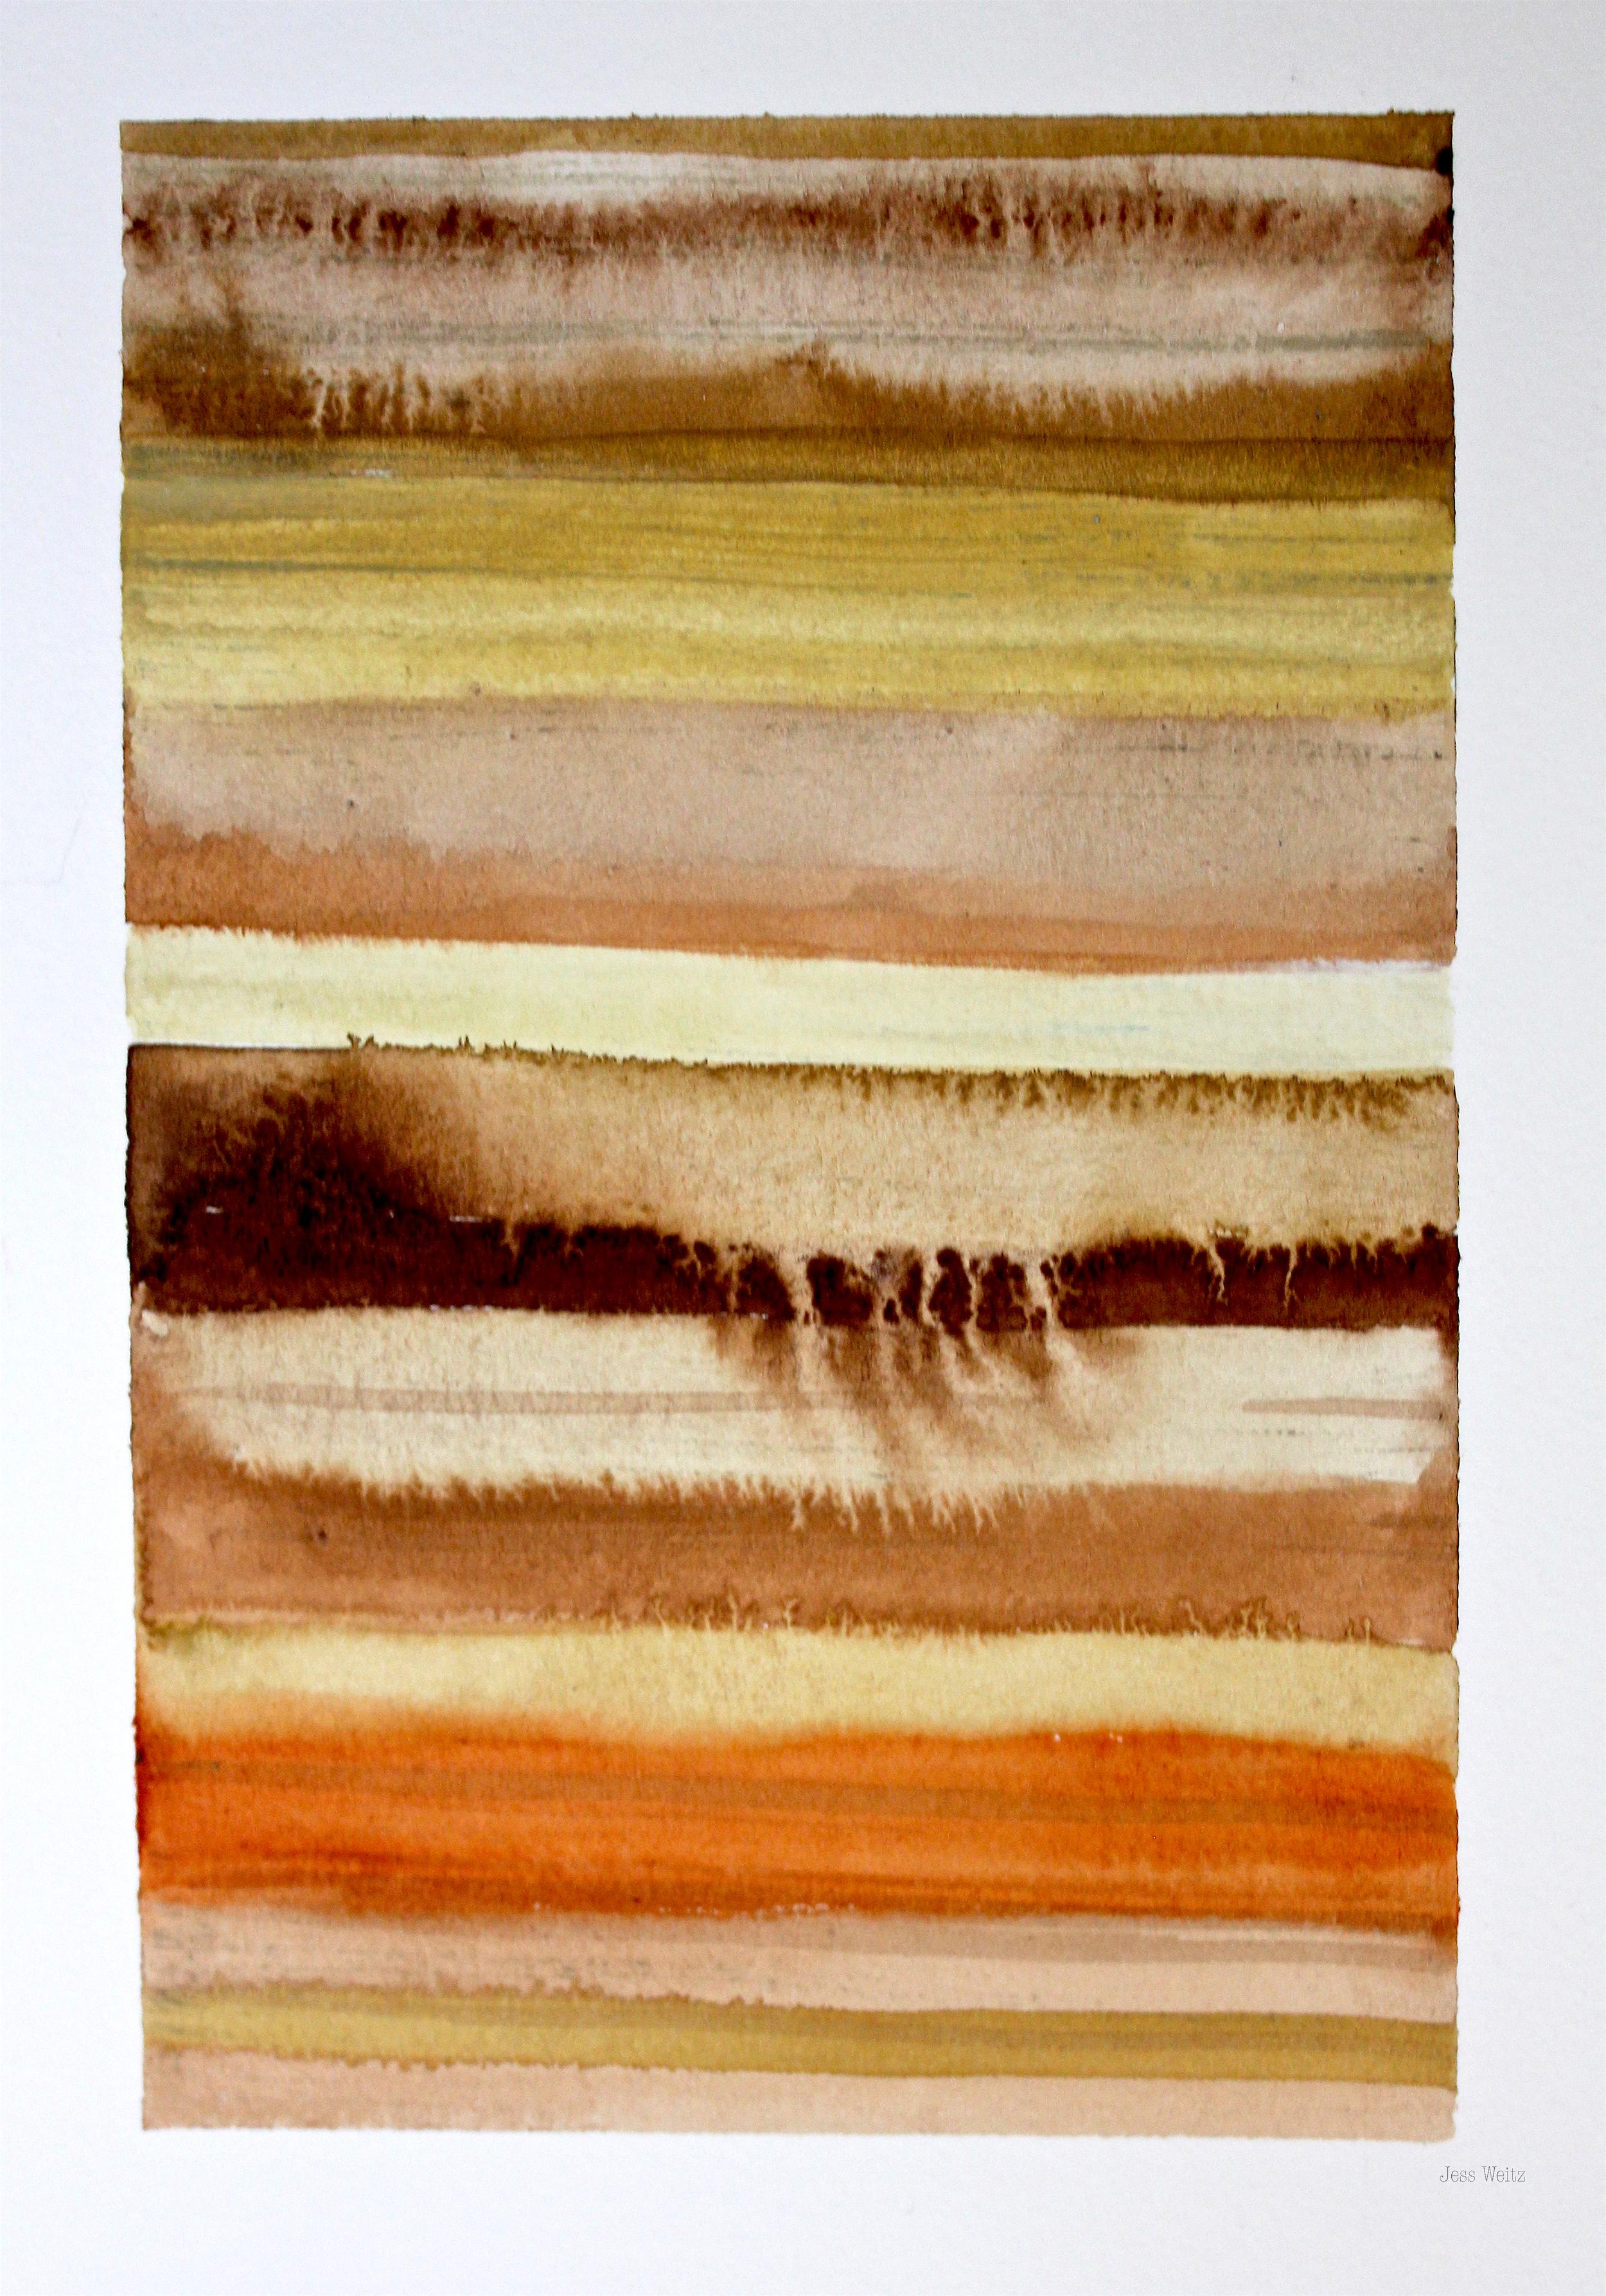 Strata |   G ouache on paper, 2015